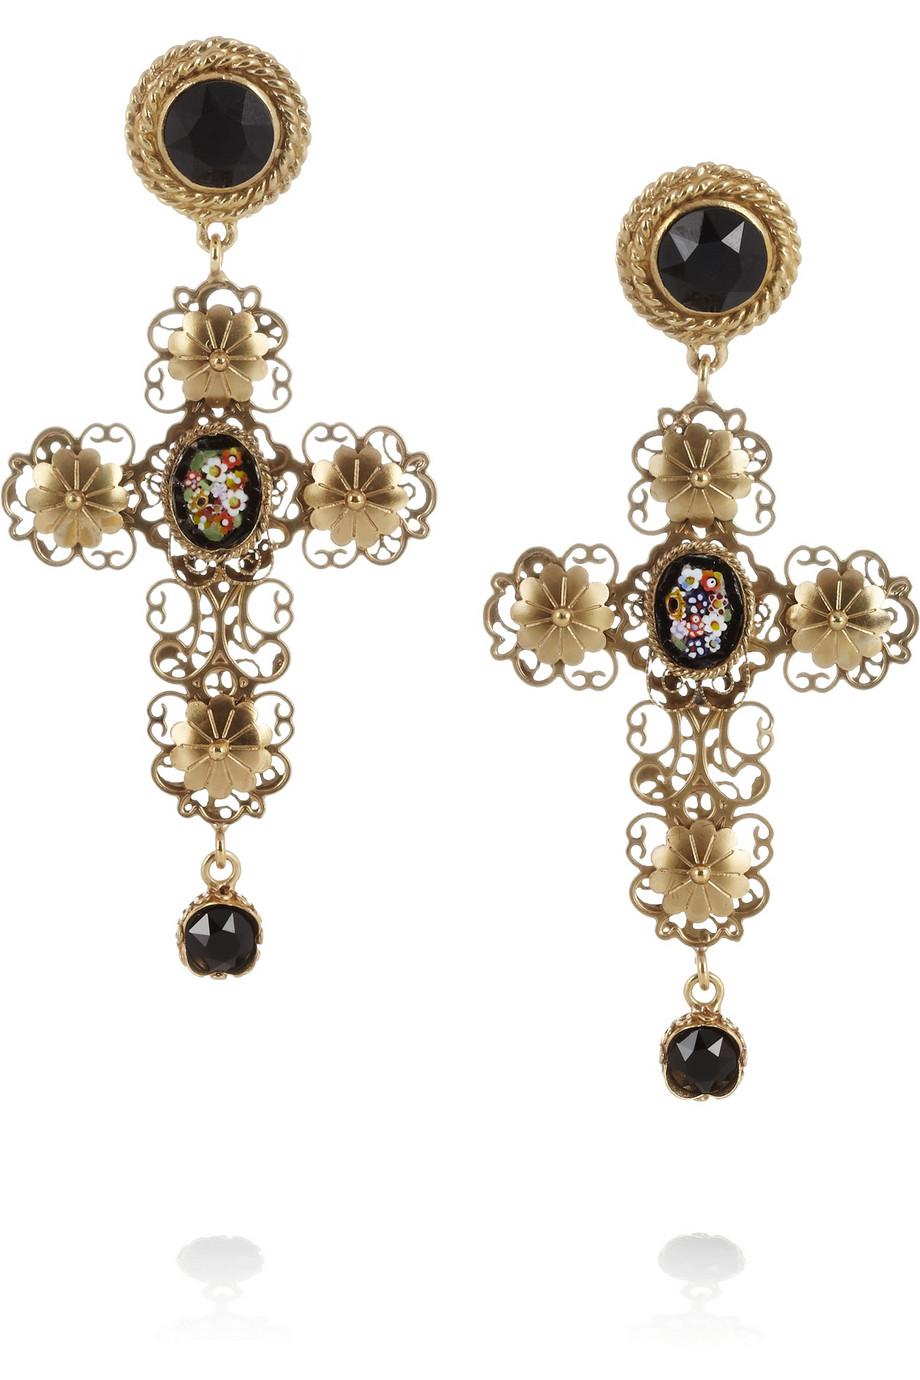 2702f45e3 Dolce & Gabbana Goldplated Swarovski Crystal Cross Clip Earrings in ...